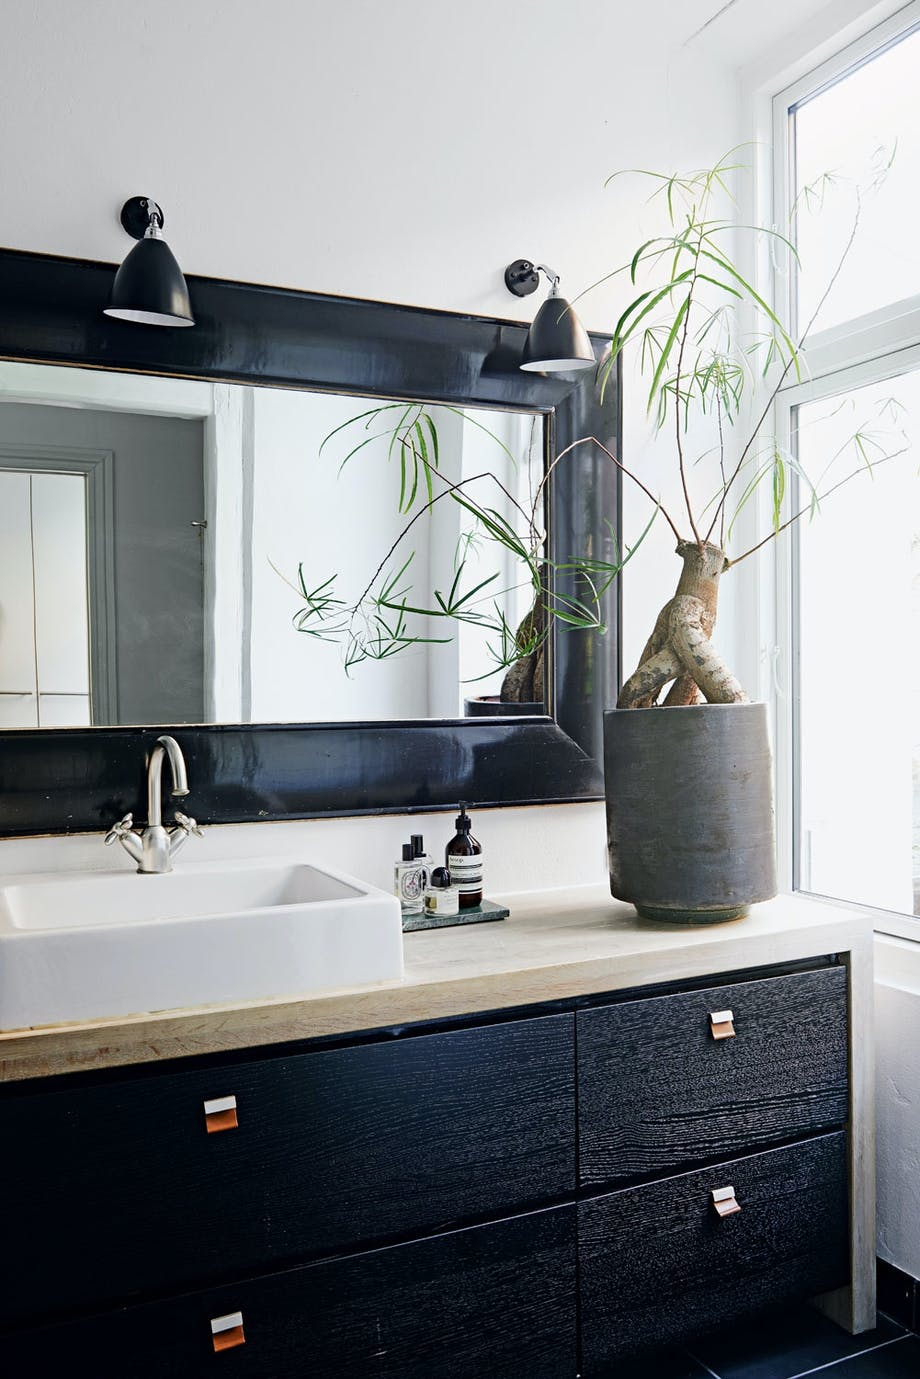 Sanselig med svarte kontraster på badet